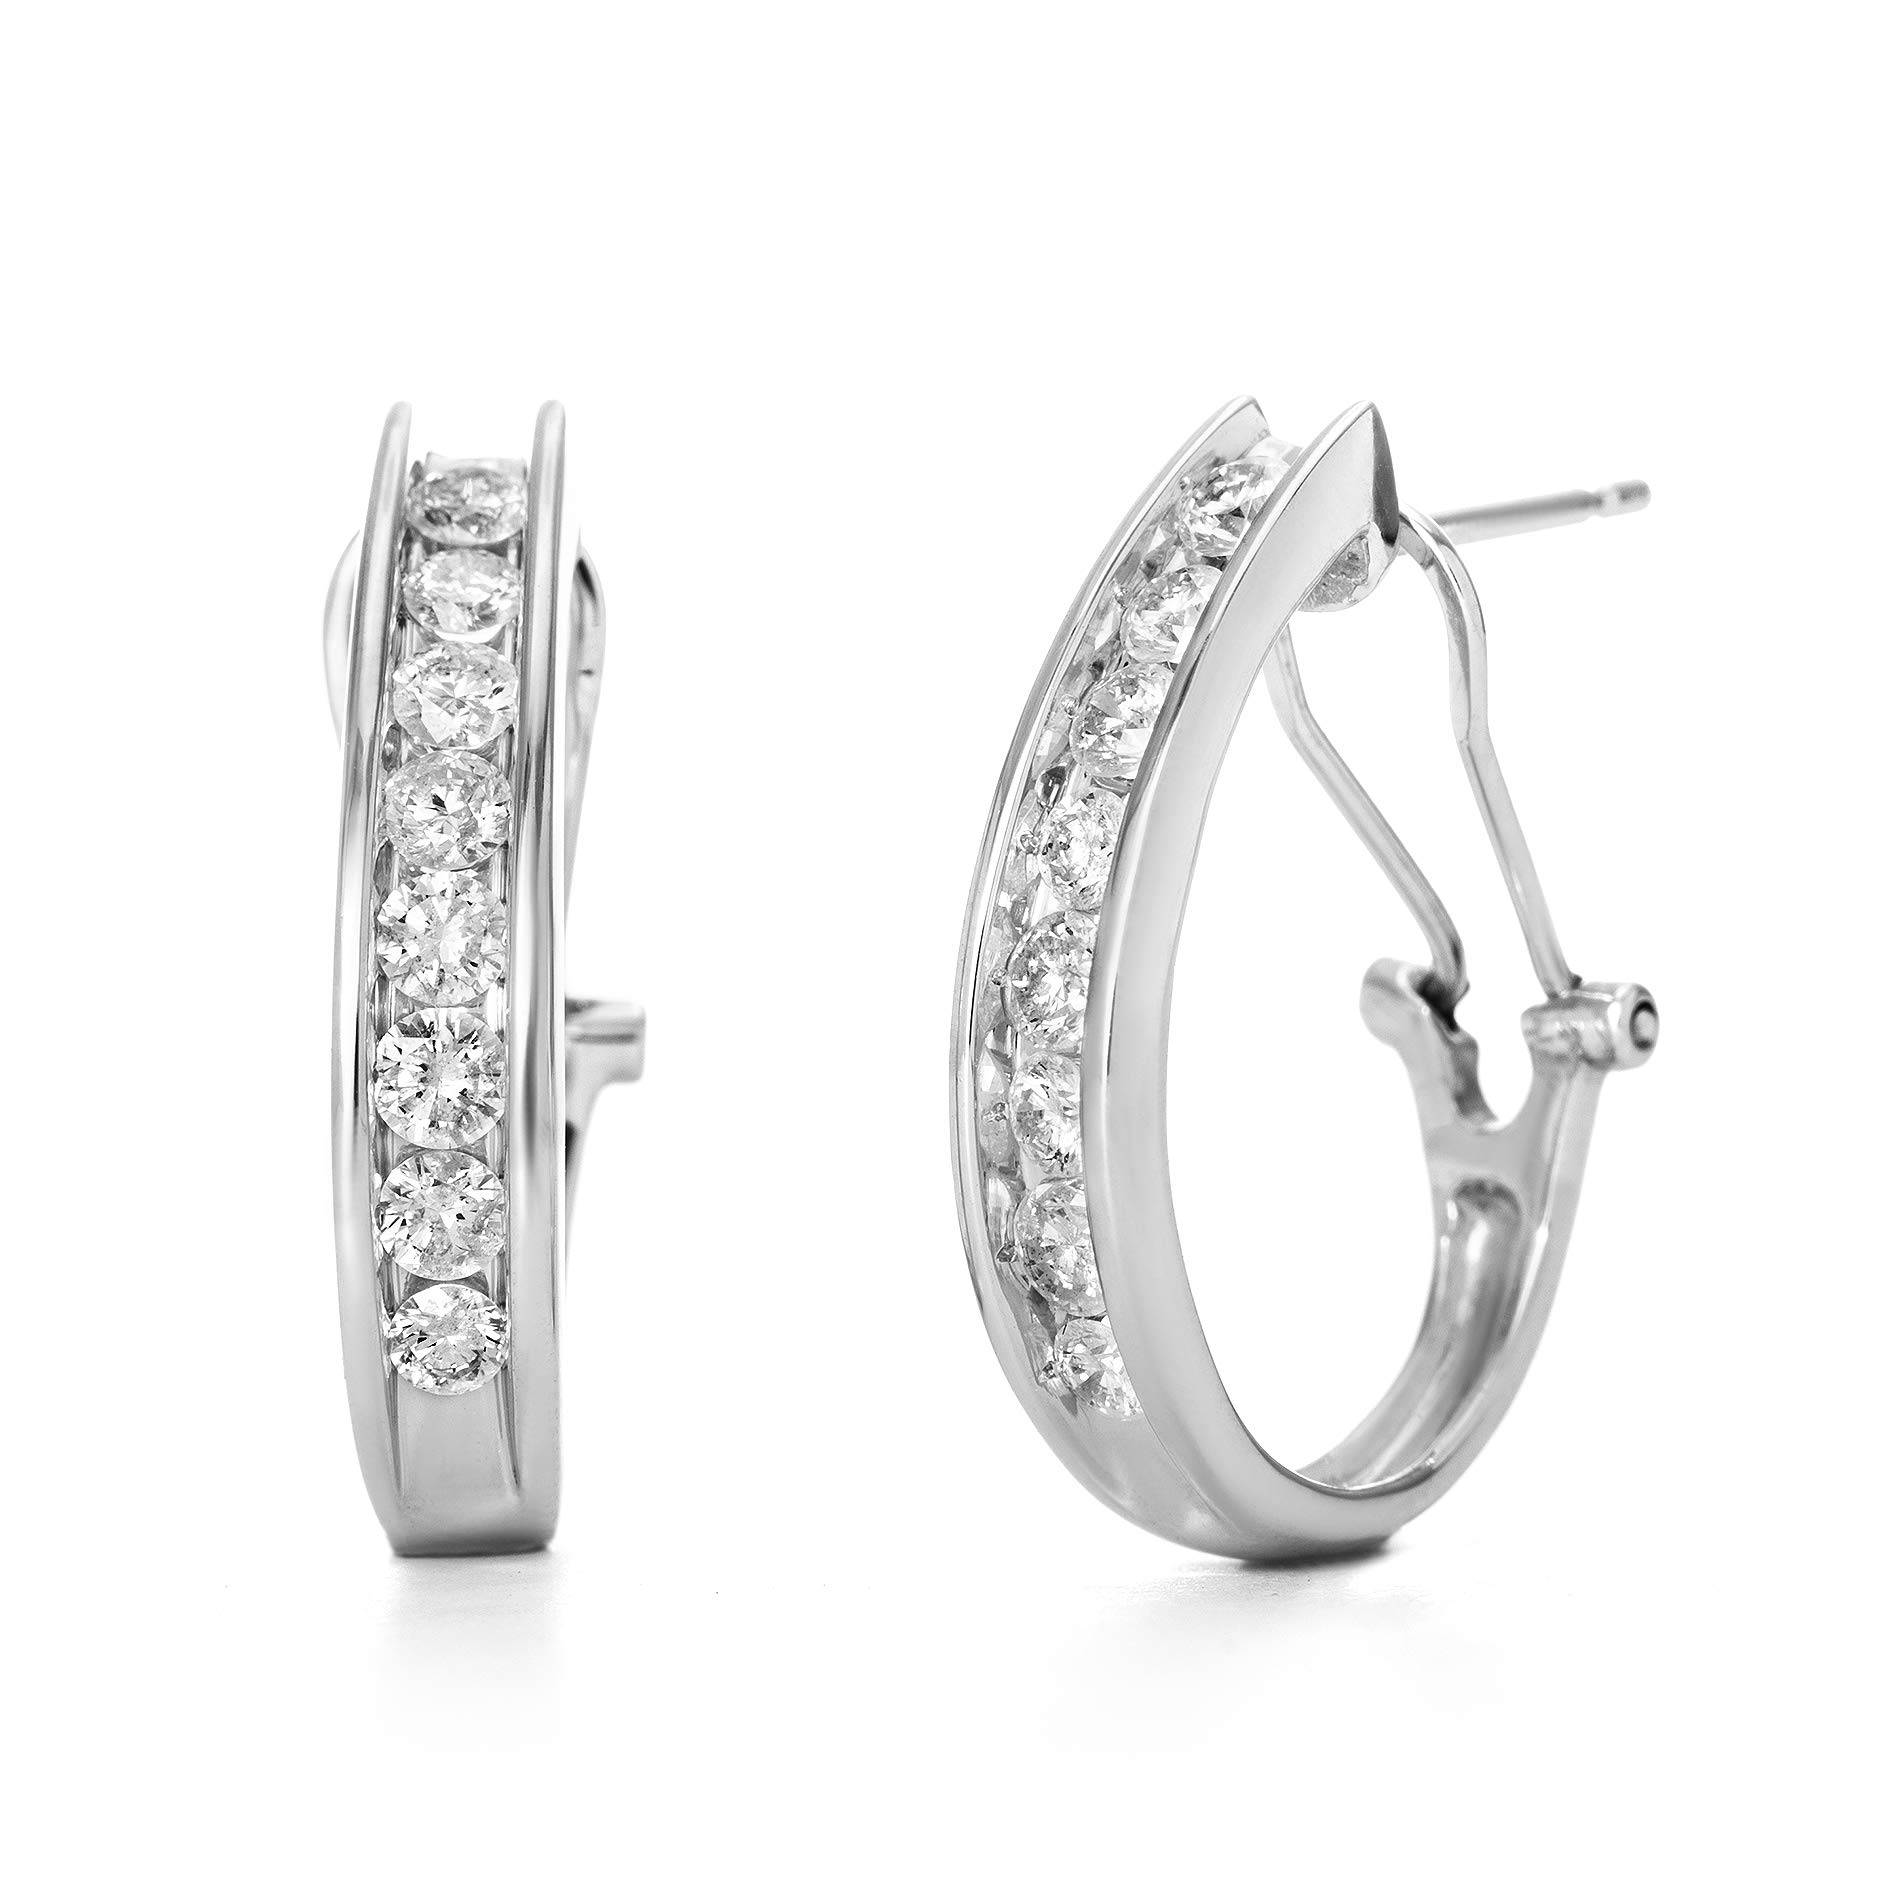 Devin Rose 10K White Gold Channel Set 1 Cttw Diamond Hoop Earrings for Women (IJ Color I2 Clarity IGL Certified)